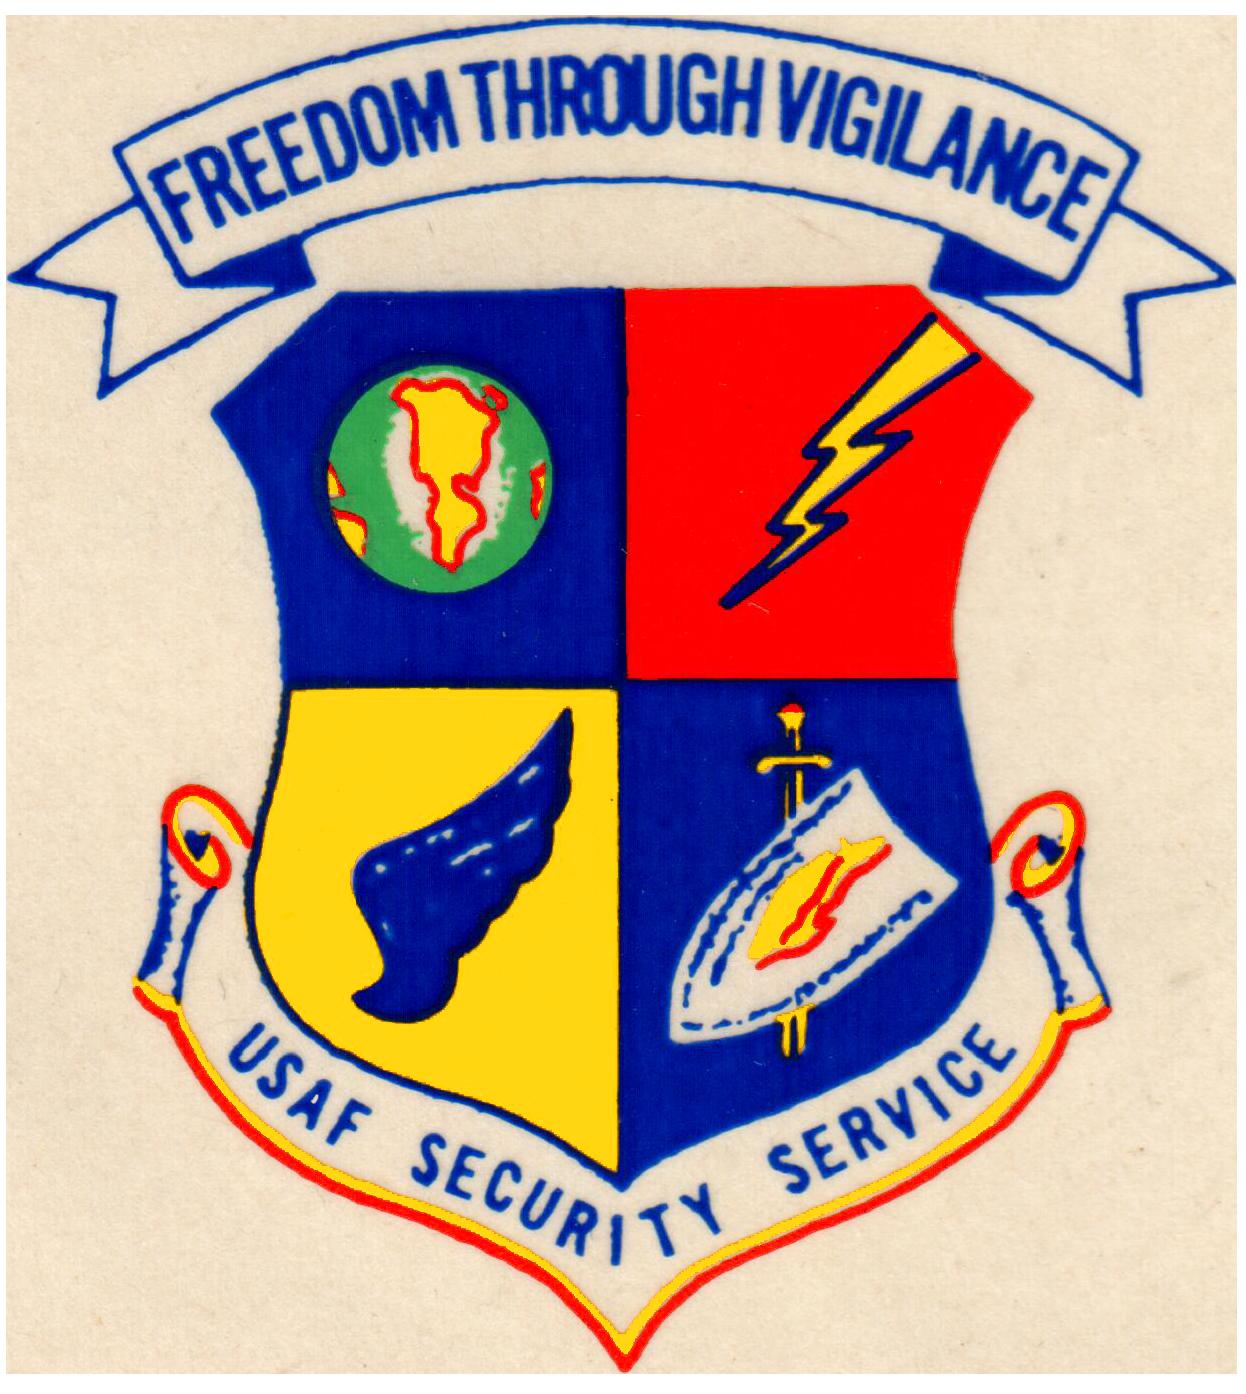 833rd aero squadron - Freedom Through Vigilance Usaf Security Service